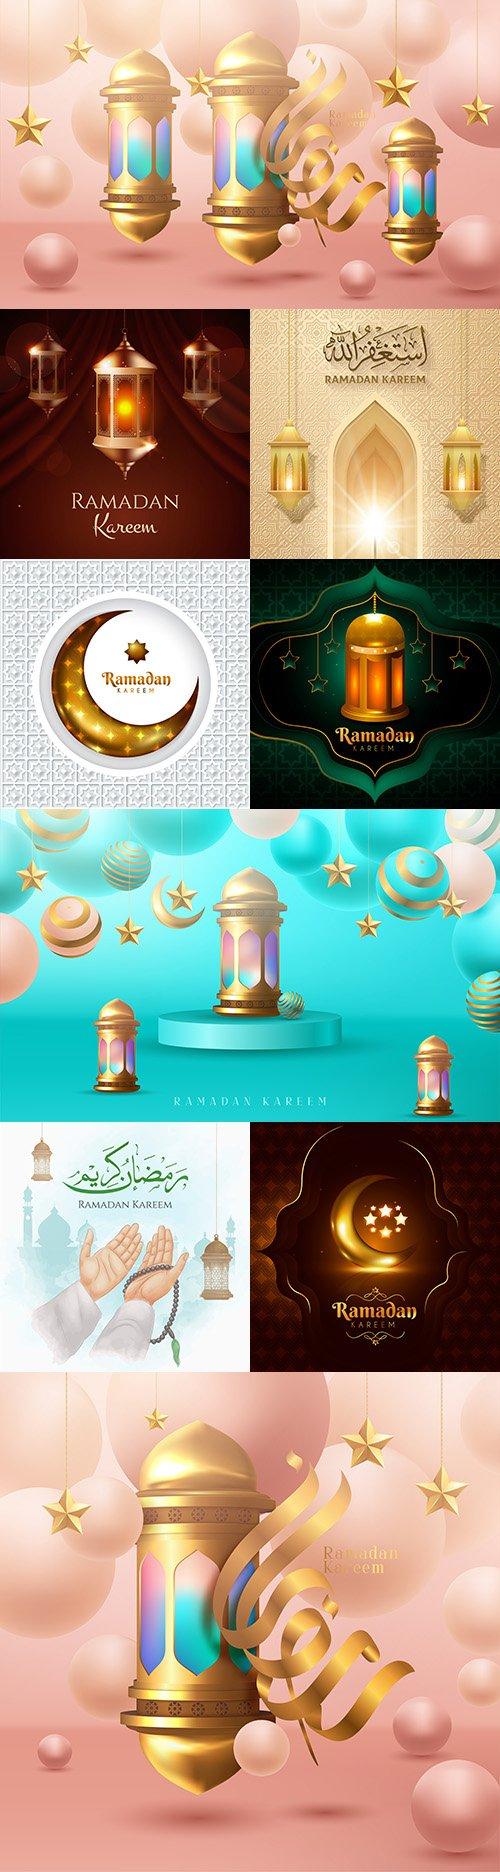 Ramadan Kareem with shining hanging gold lights